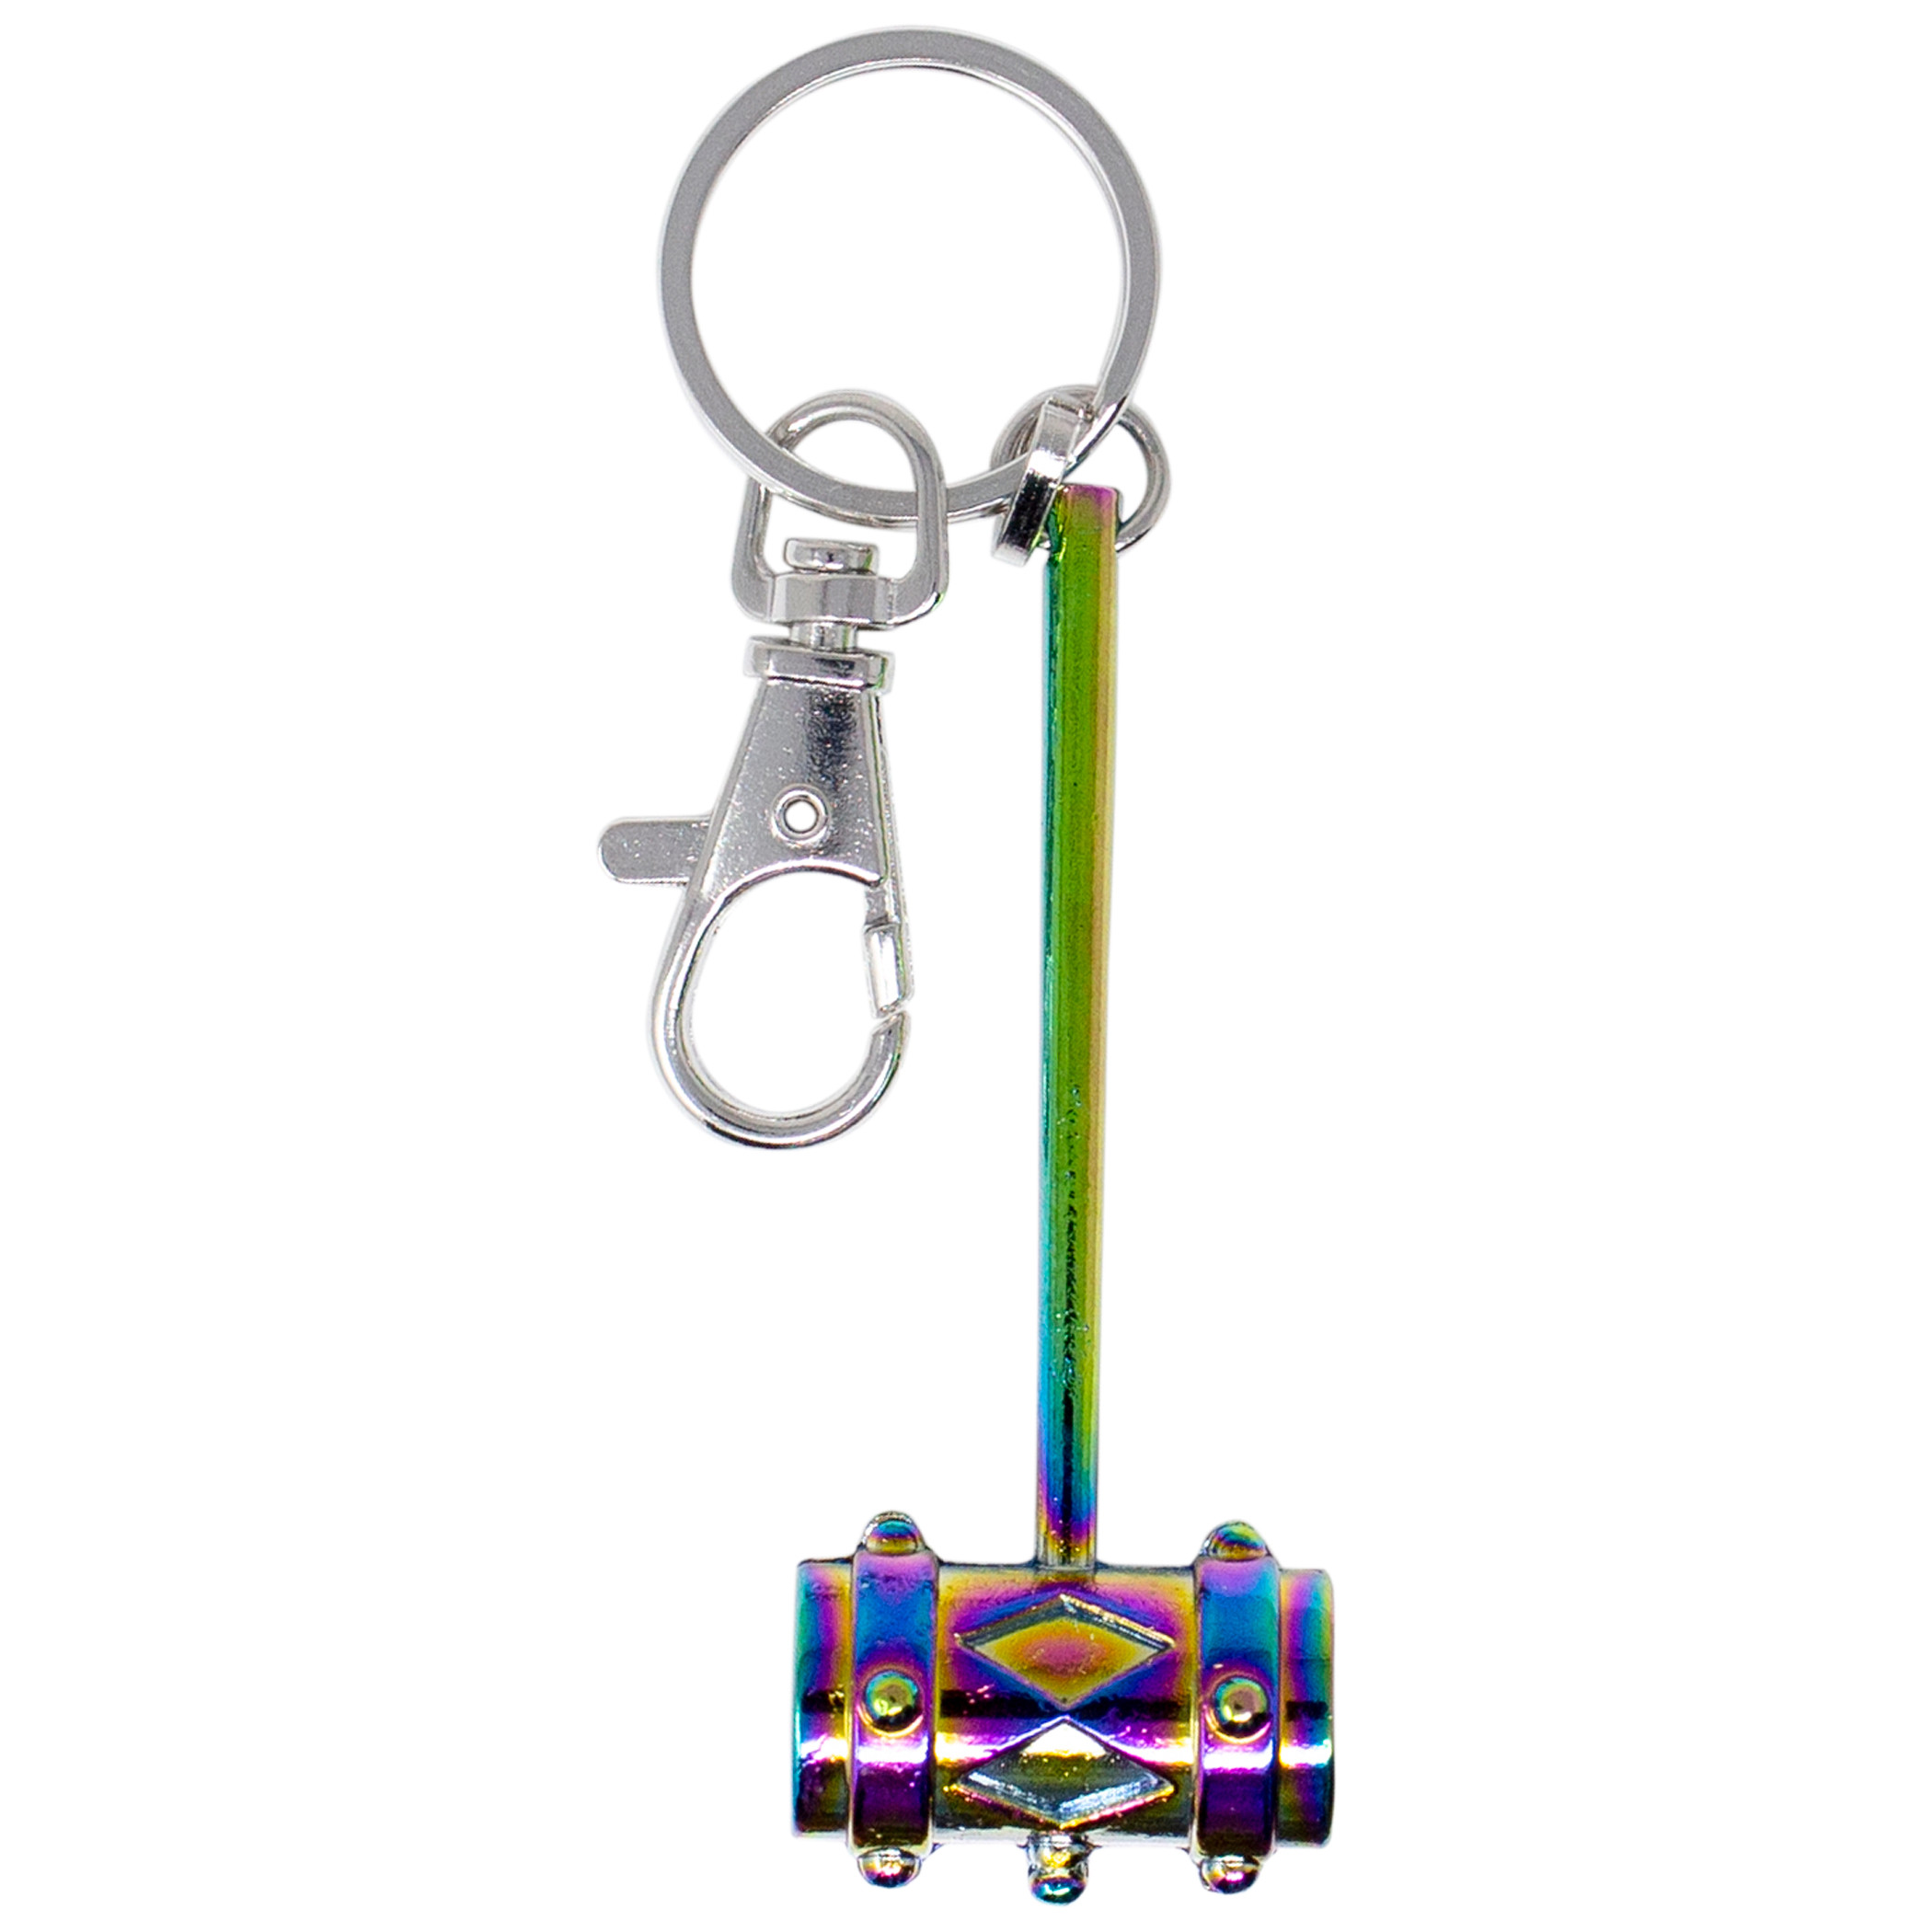 Harley Quinn's Mallet Keychain with Rainbow Metallic Finish